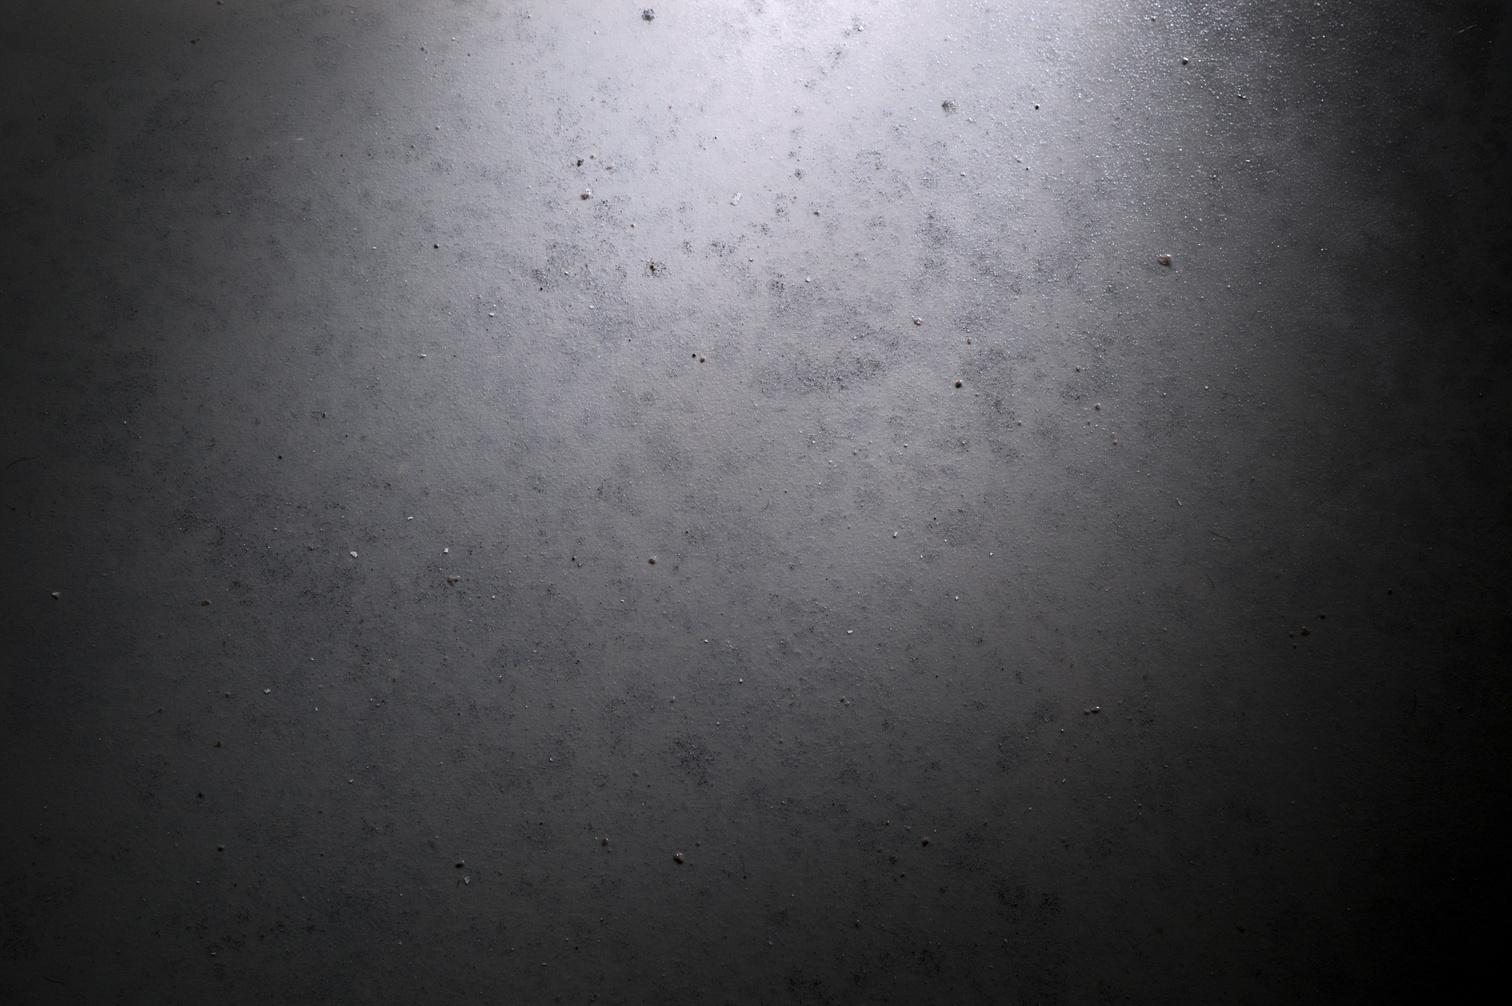 IlGattaRossa - 21 Mar 2015 - Ribalta - DSC_0041